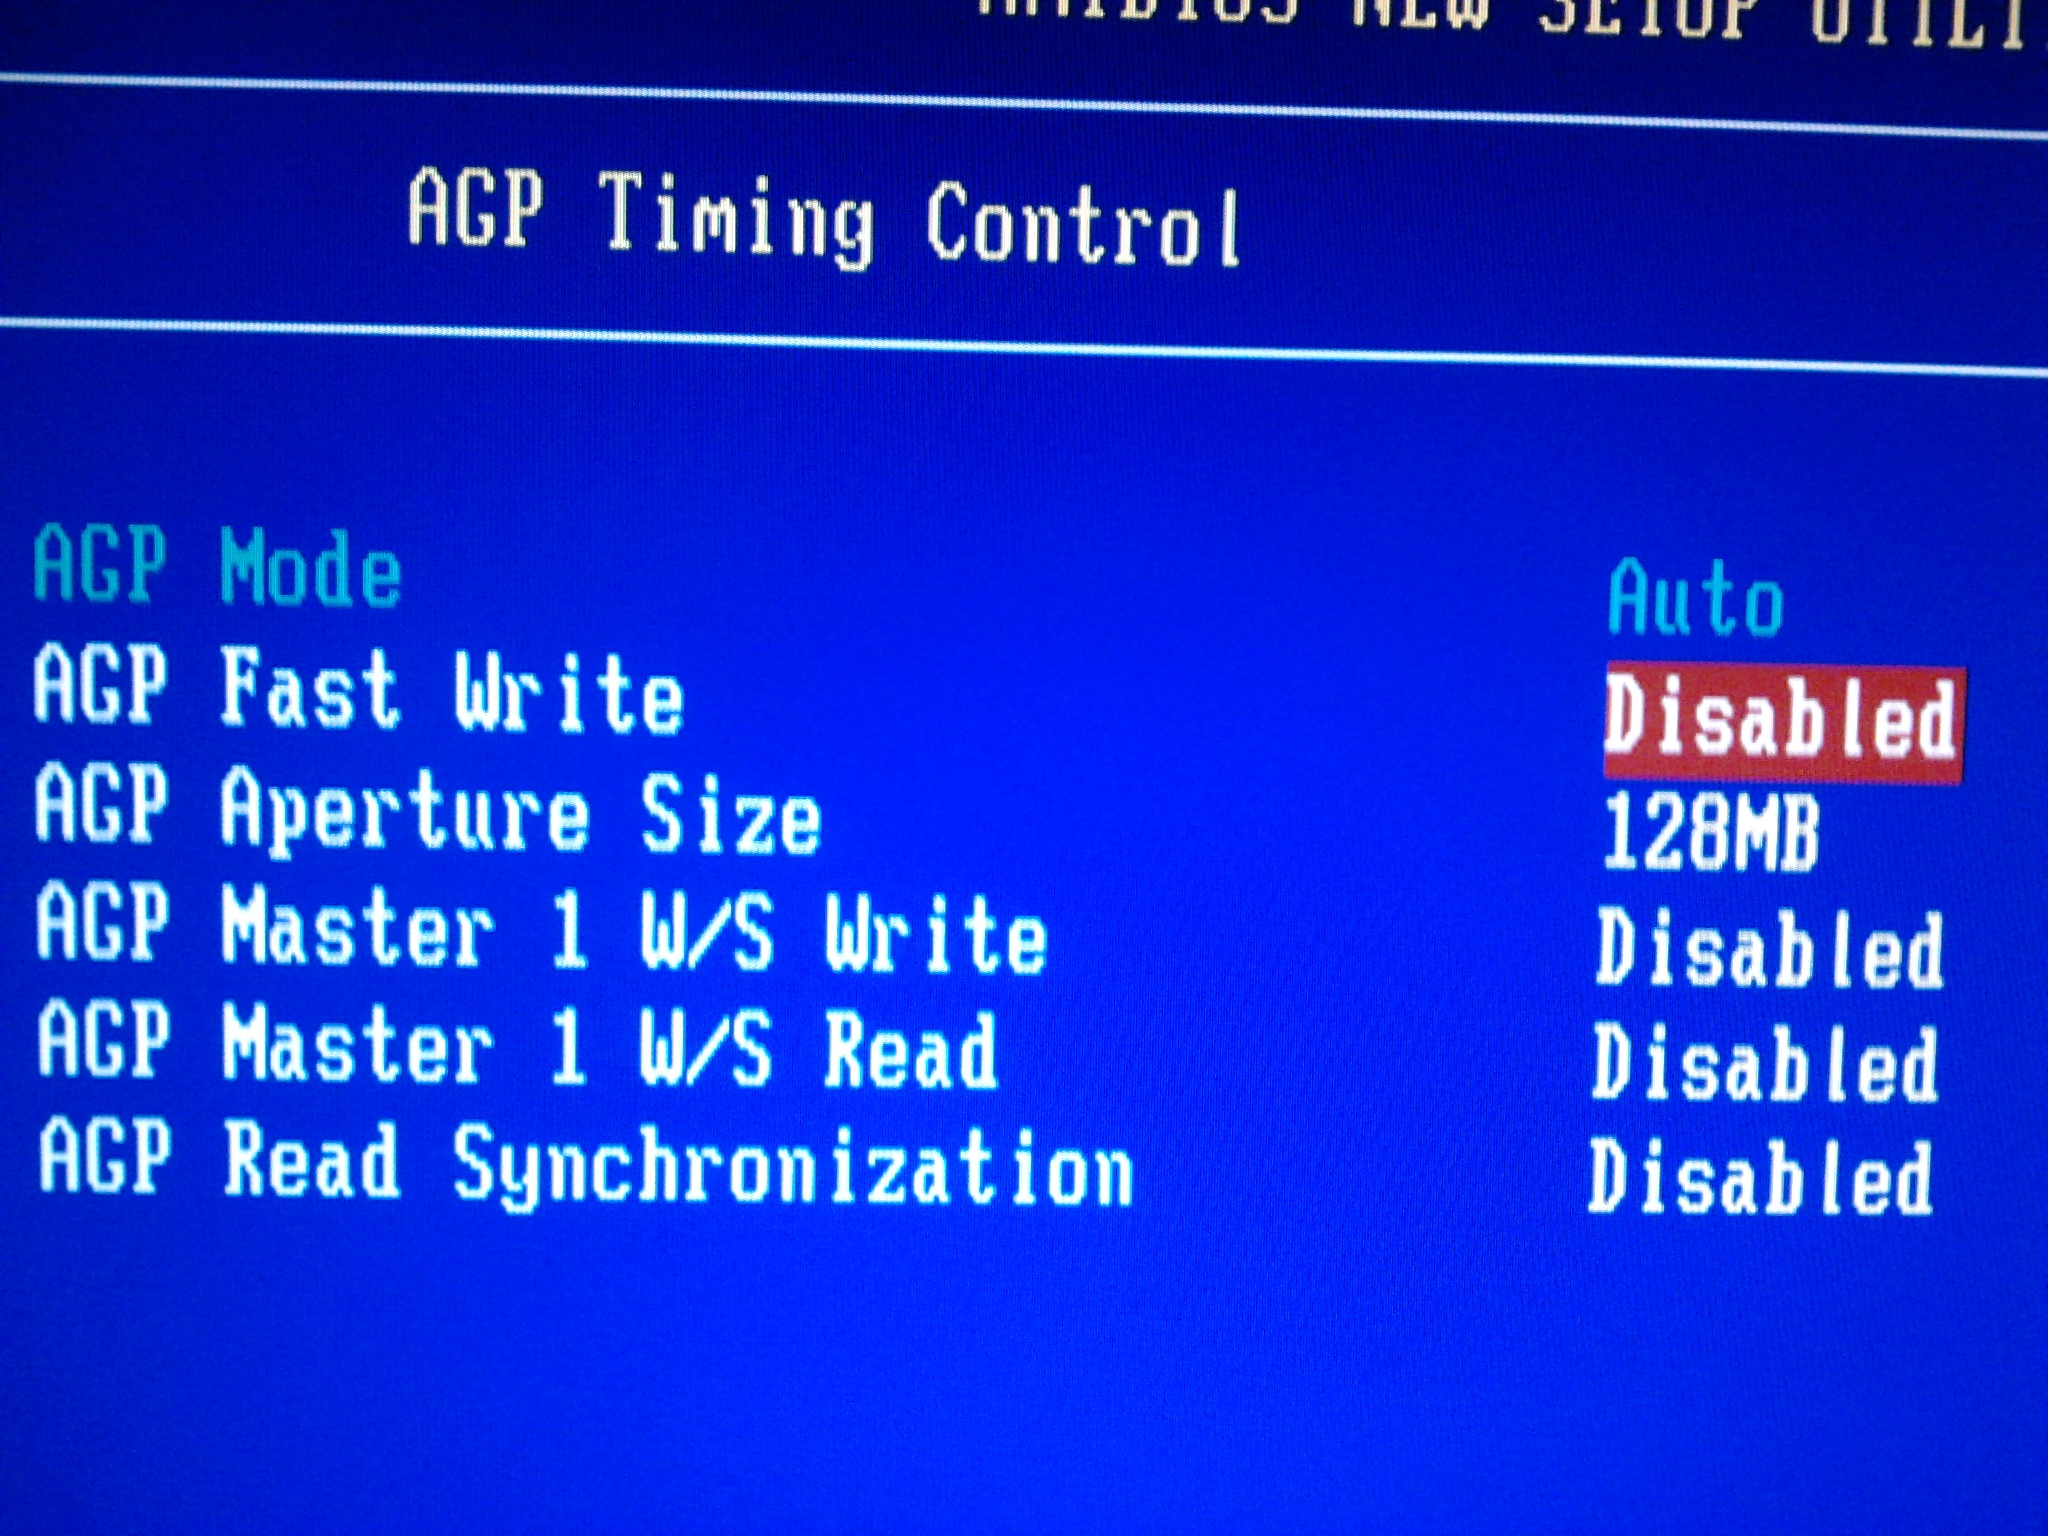 MSI KT4AV - Po dw�ch minutach dzia�ania znika obraz(Radeon 9600 PRO/Radeon 9250)